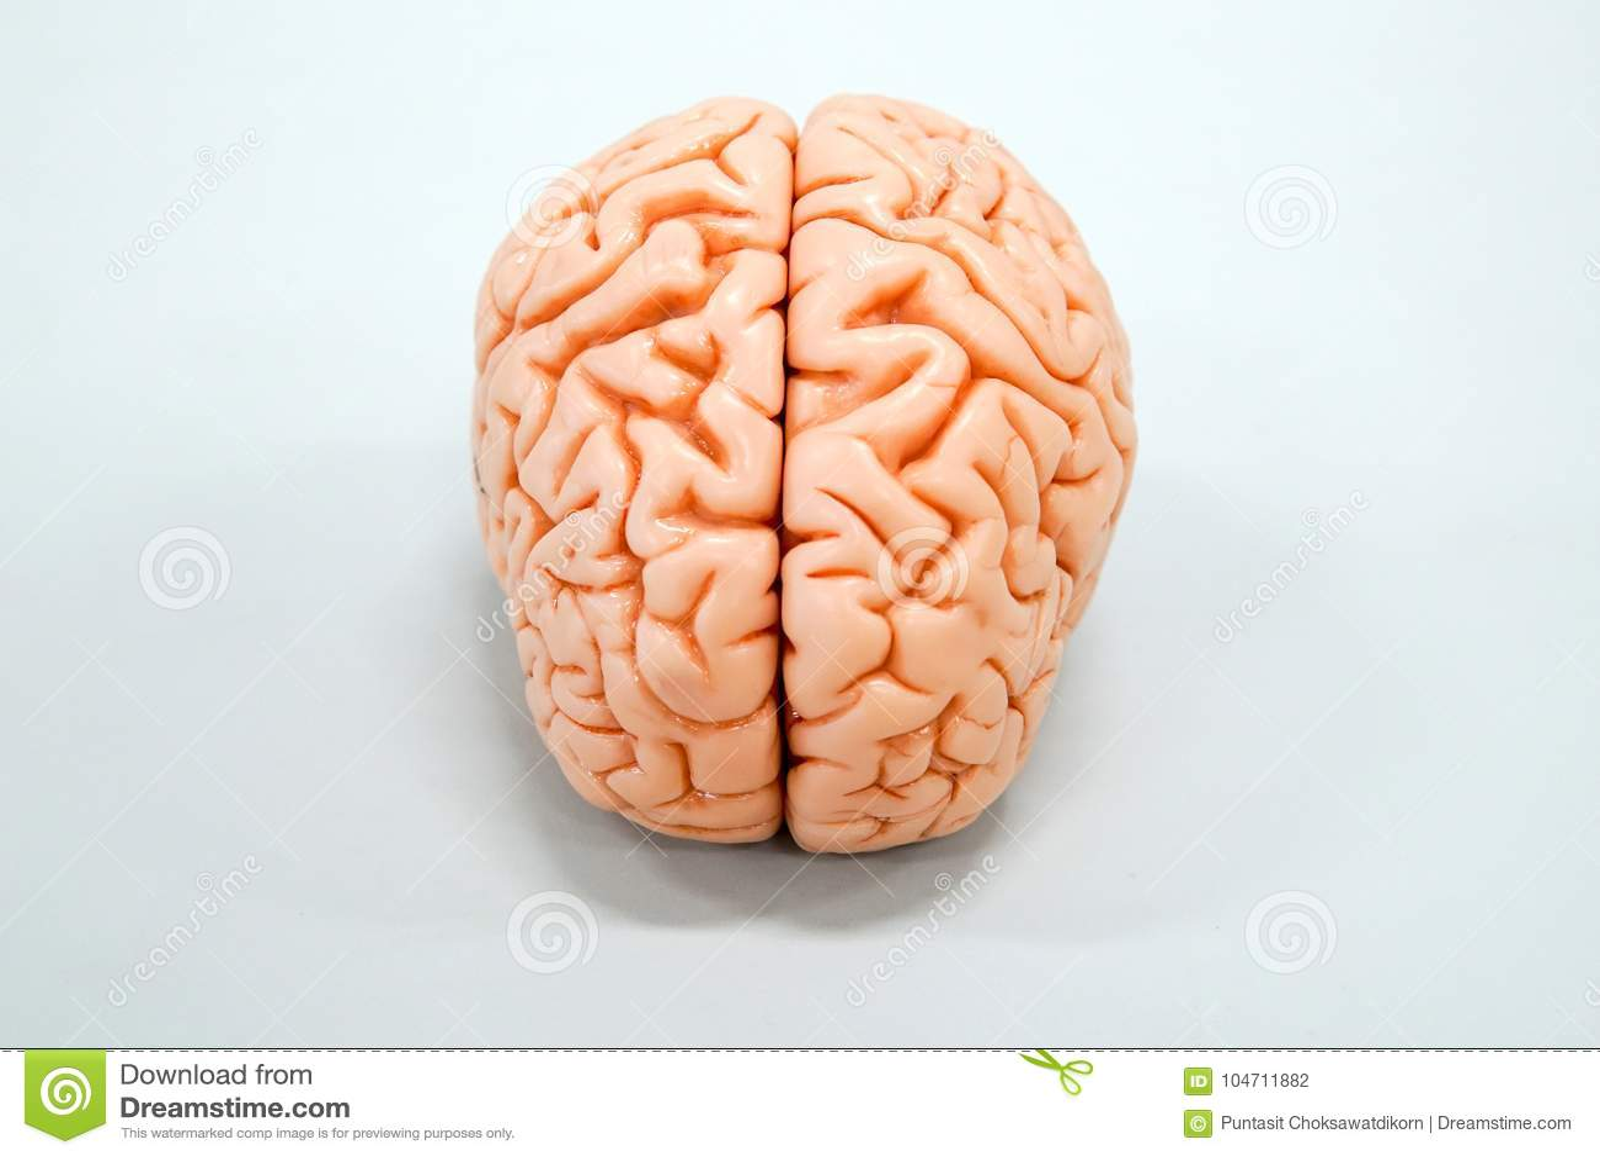 Human Brain Anatomy Model Stock Photo Image Of Anatomical 104711882